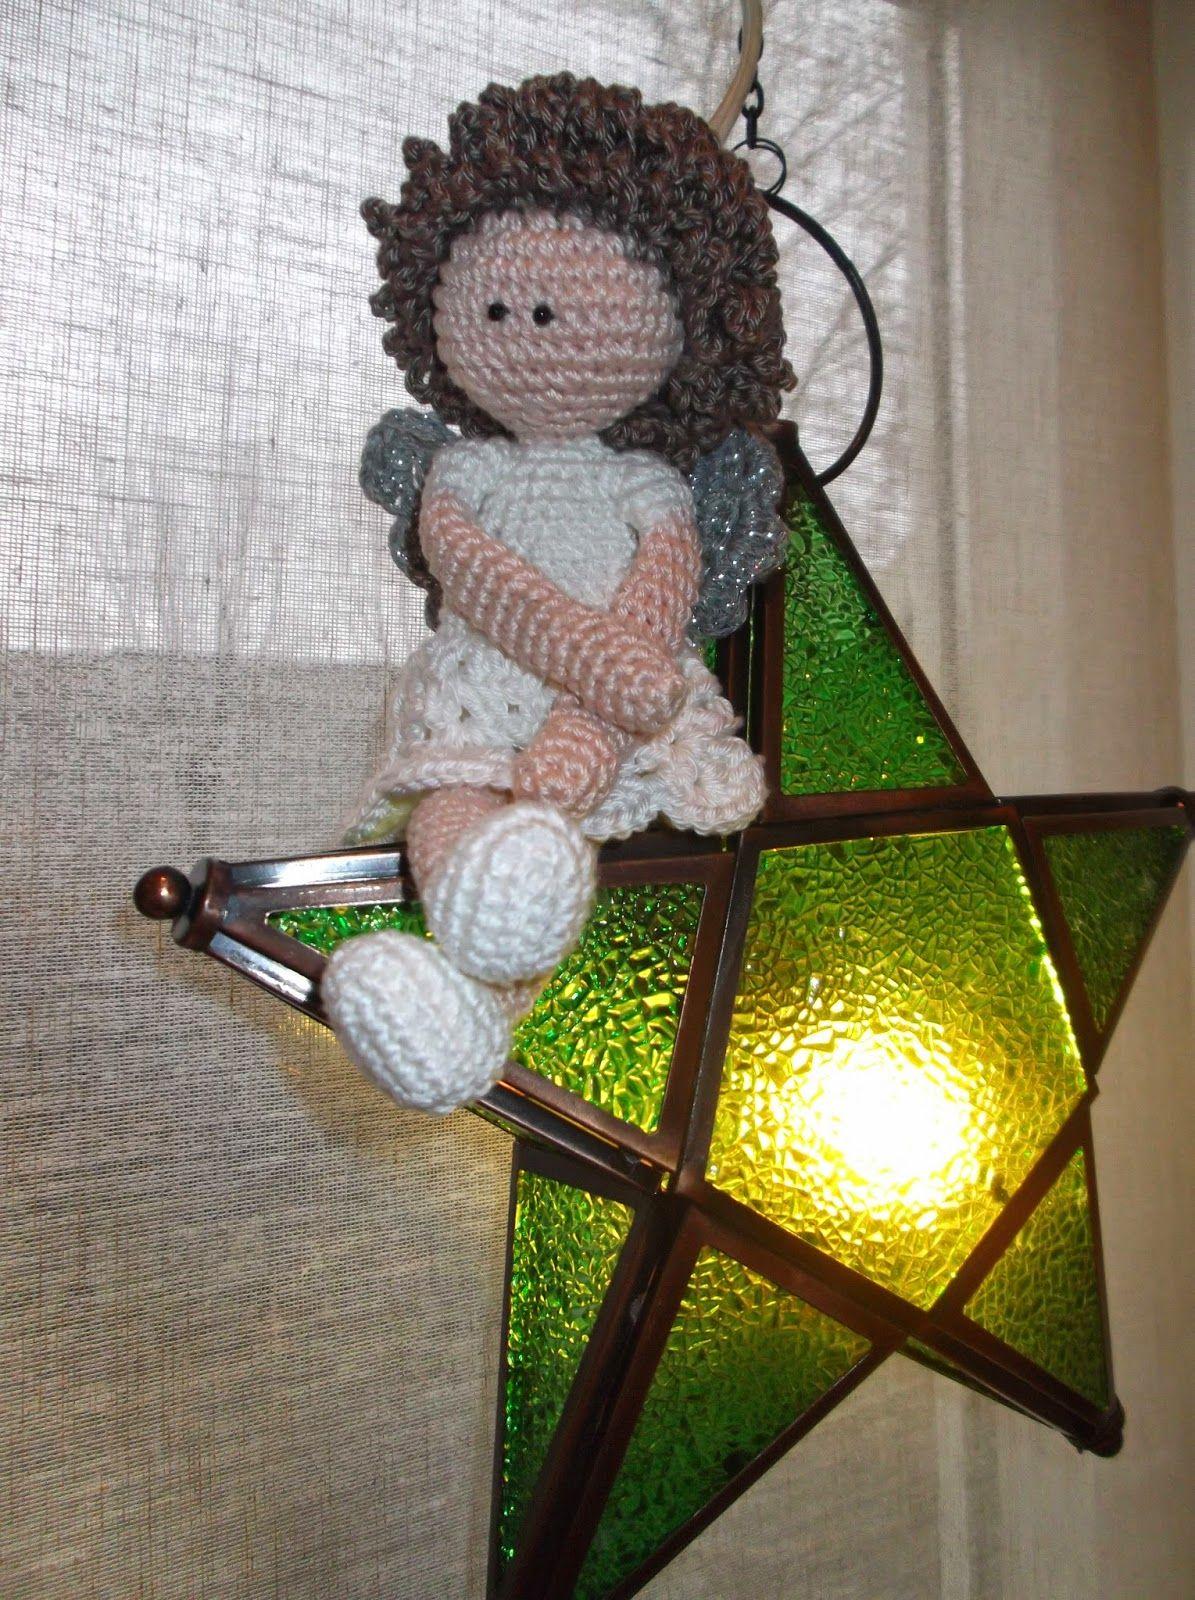 Haakpatroon Engel Croshet Christmas Amigurumi Crochet Crochet